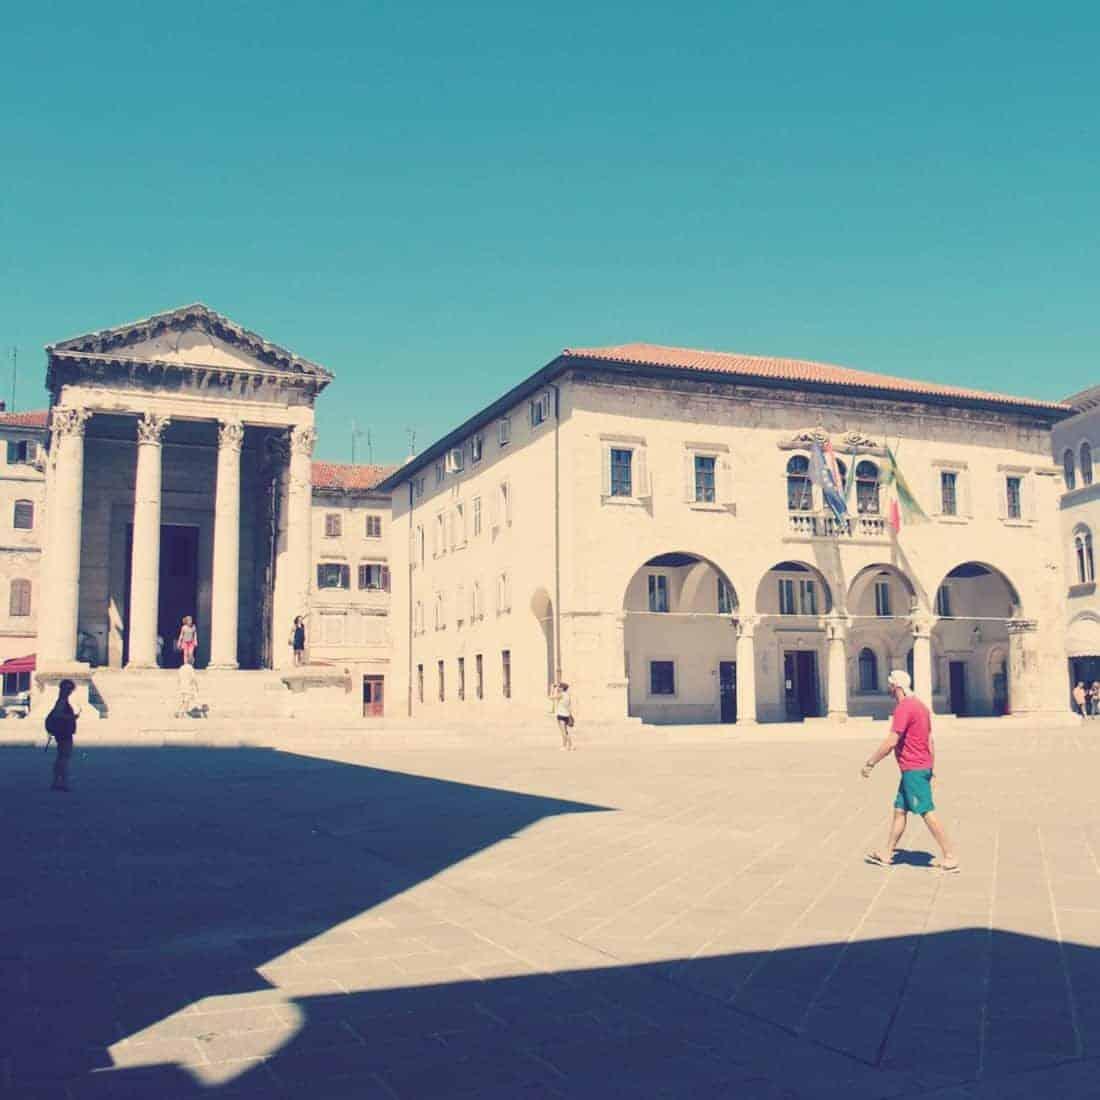 Forum square with Augustus Temple, Pula, Croatia (2016-08-27)